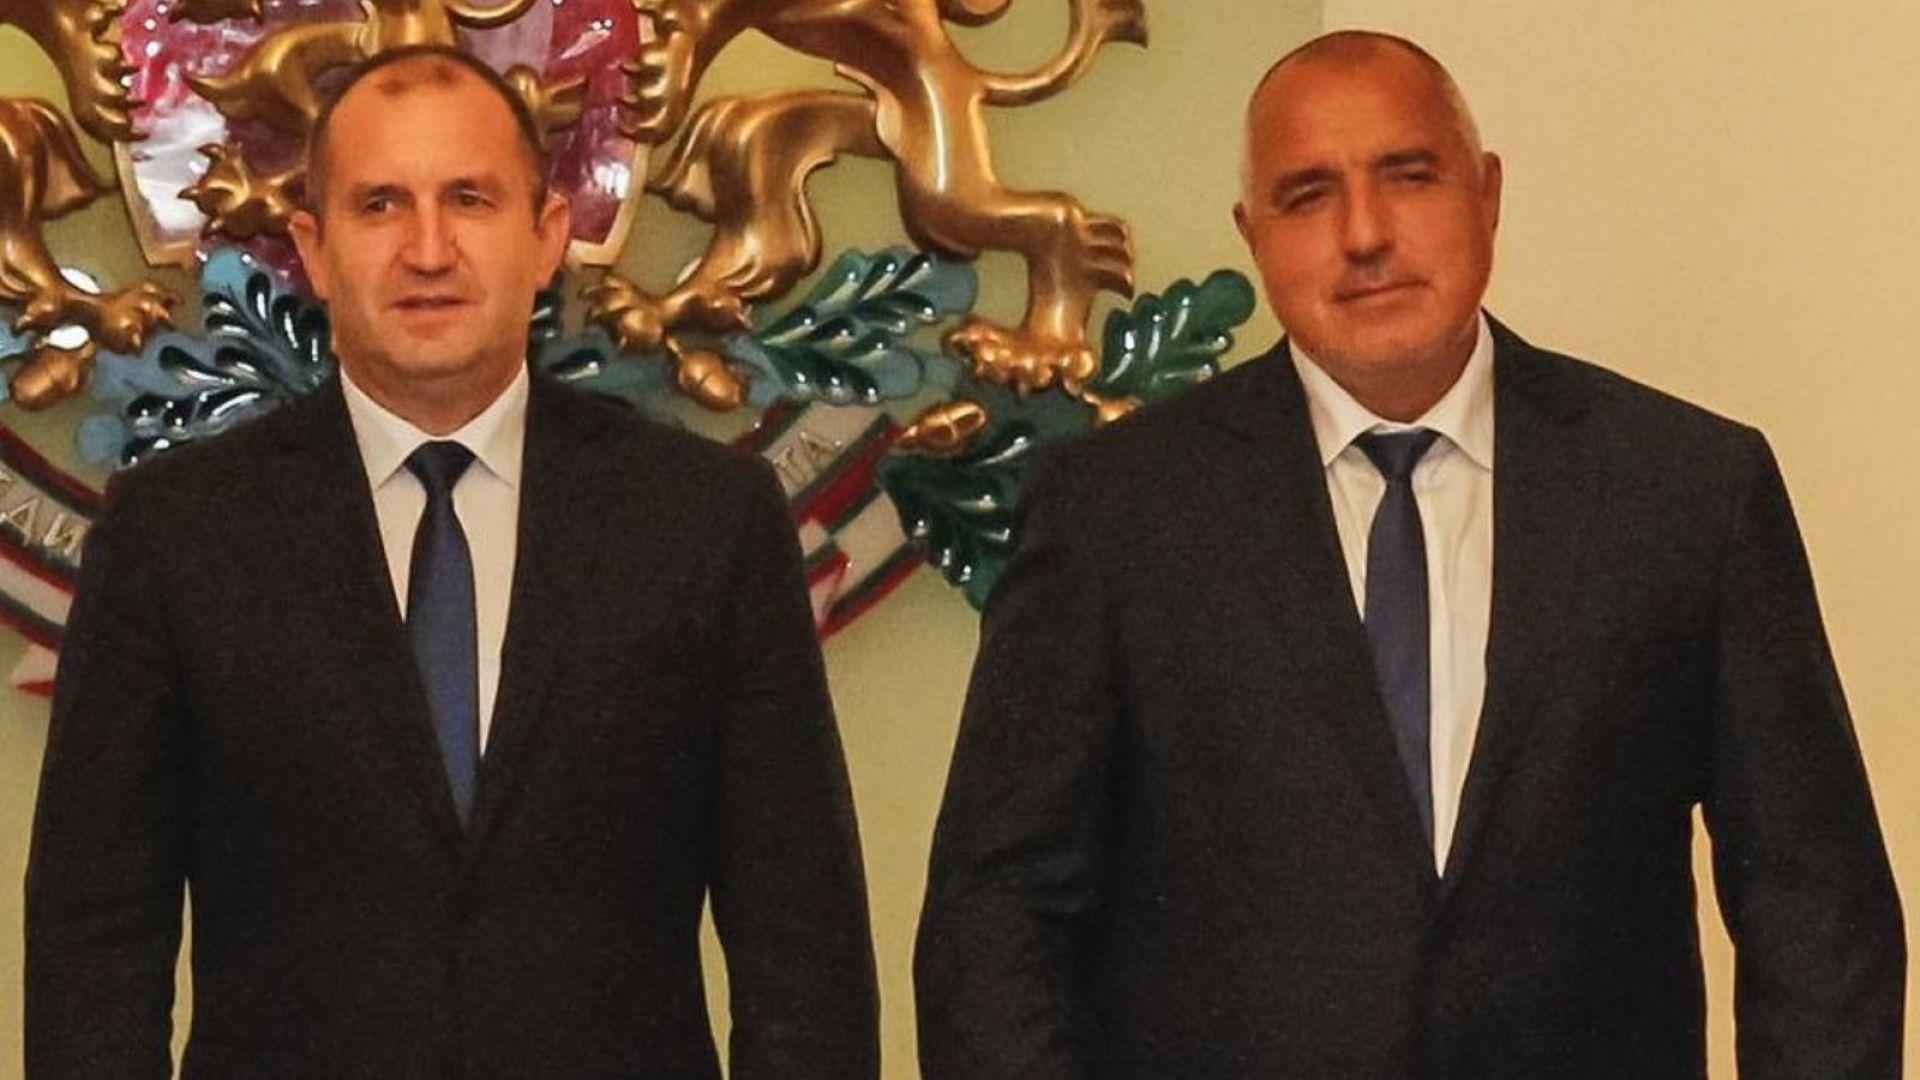 Борисов  и Радев с честитки към българските студенти